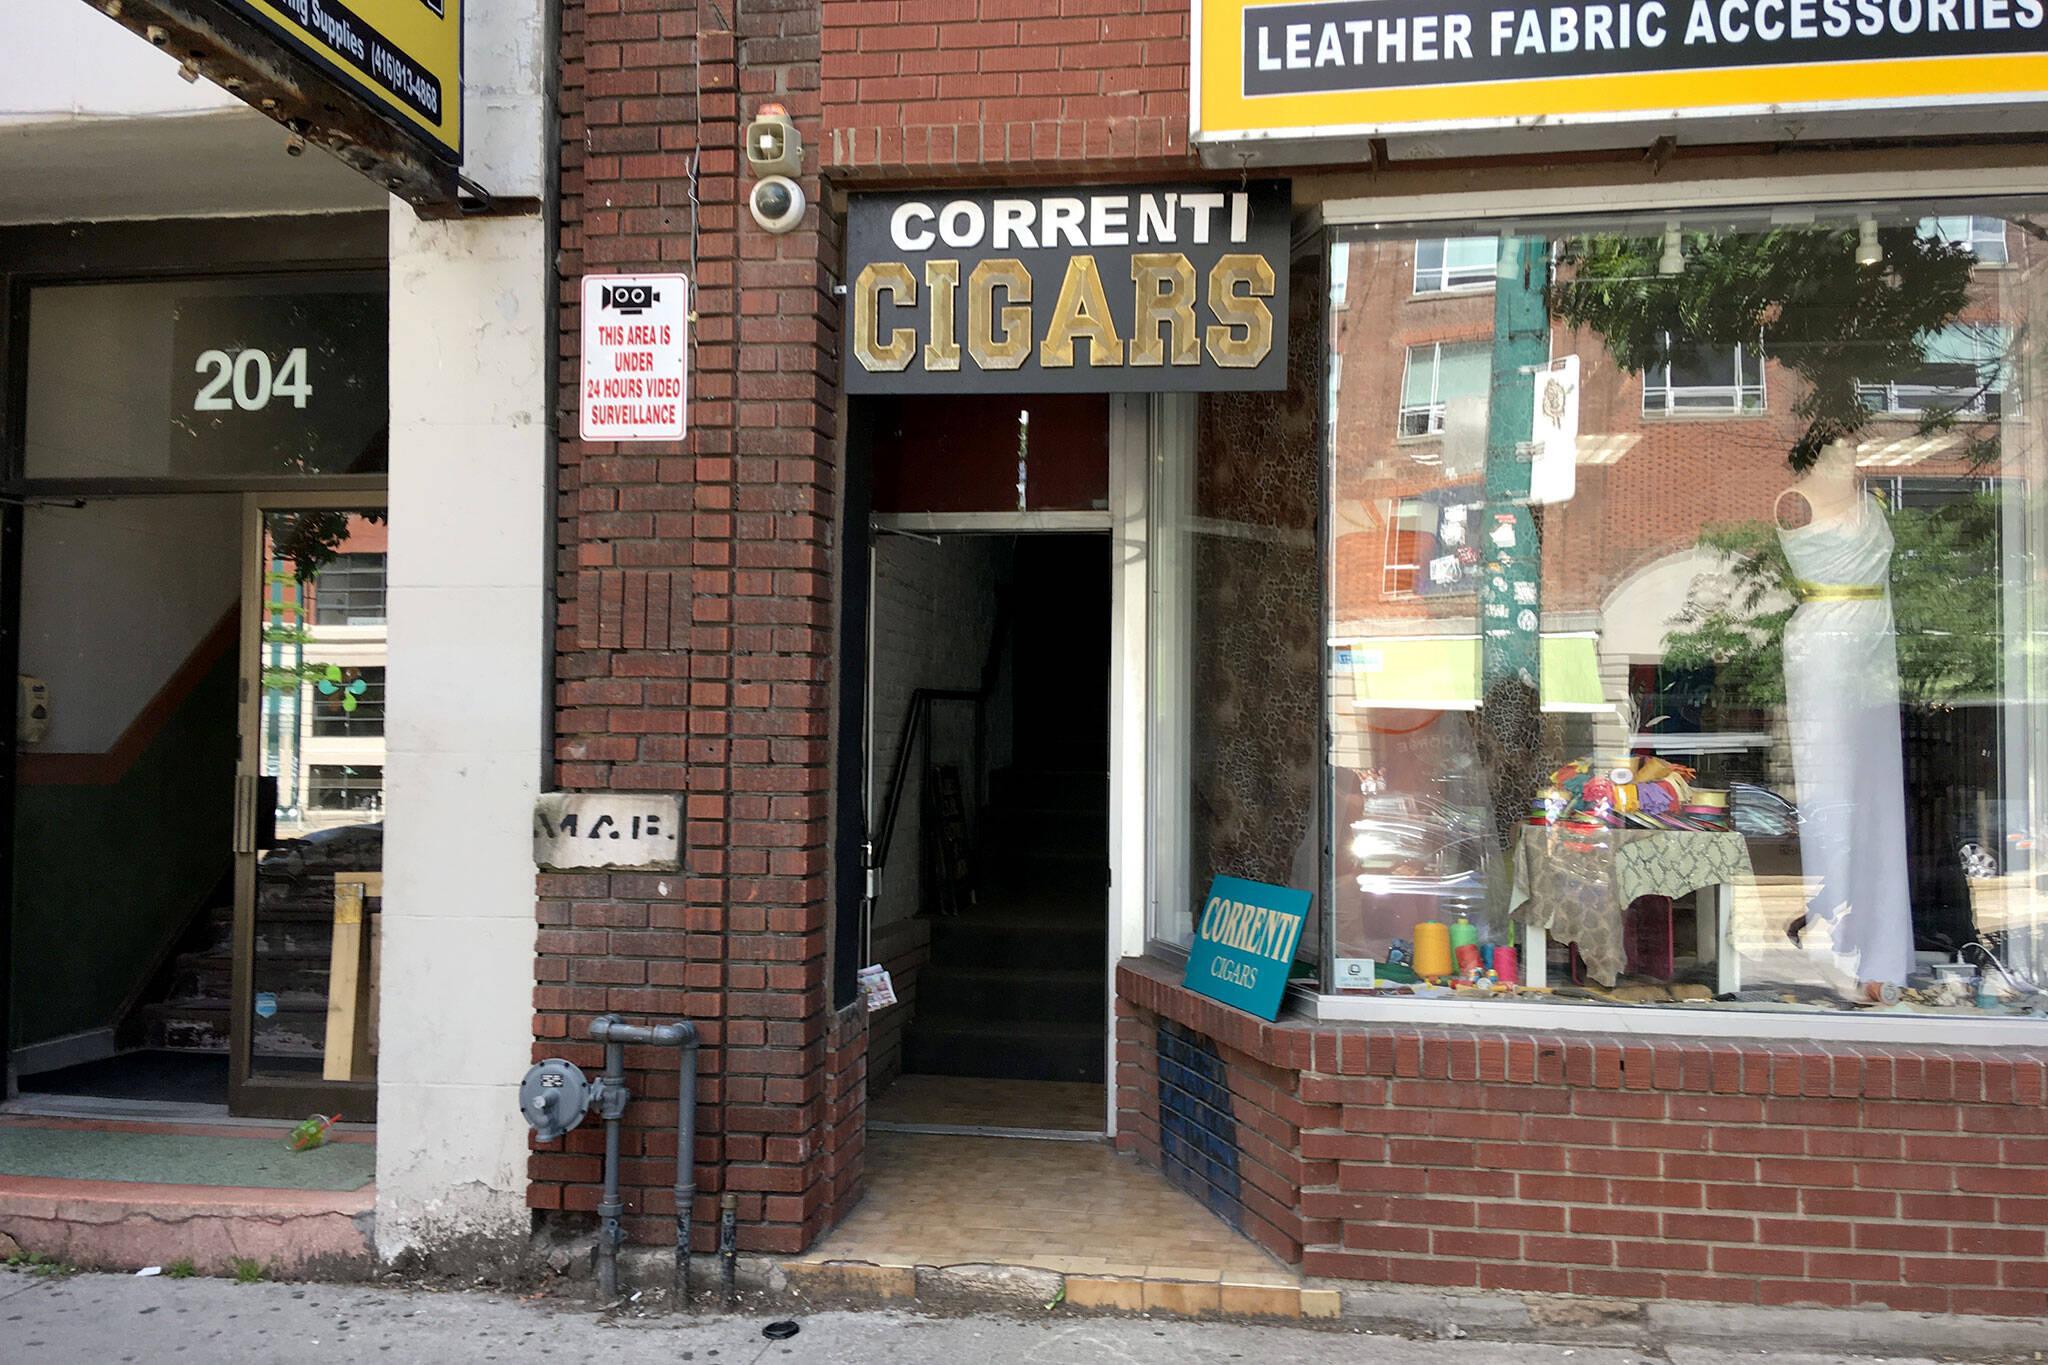 Correnti Cigars Toronto